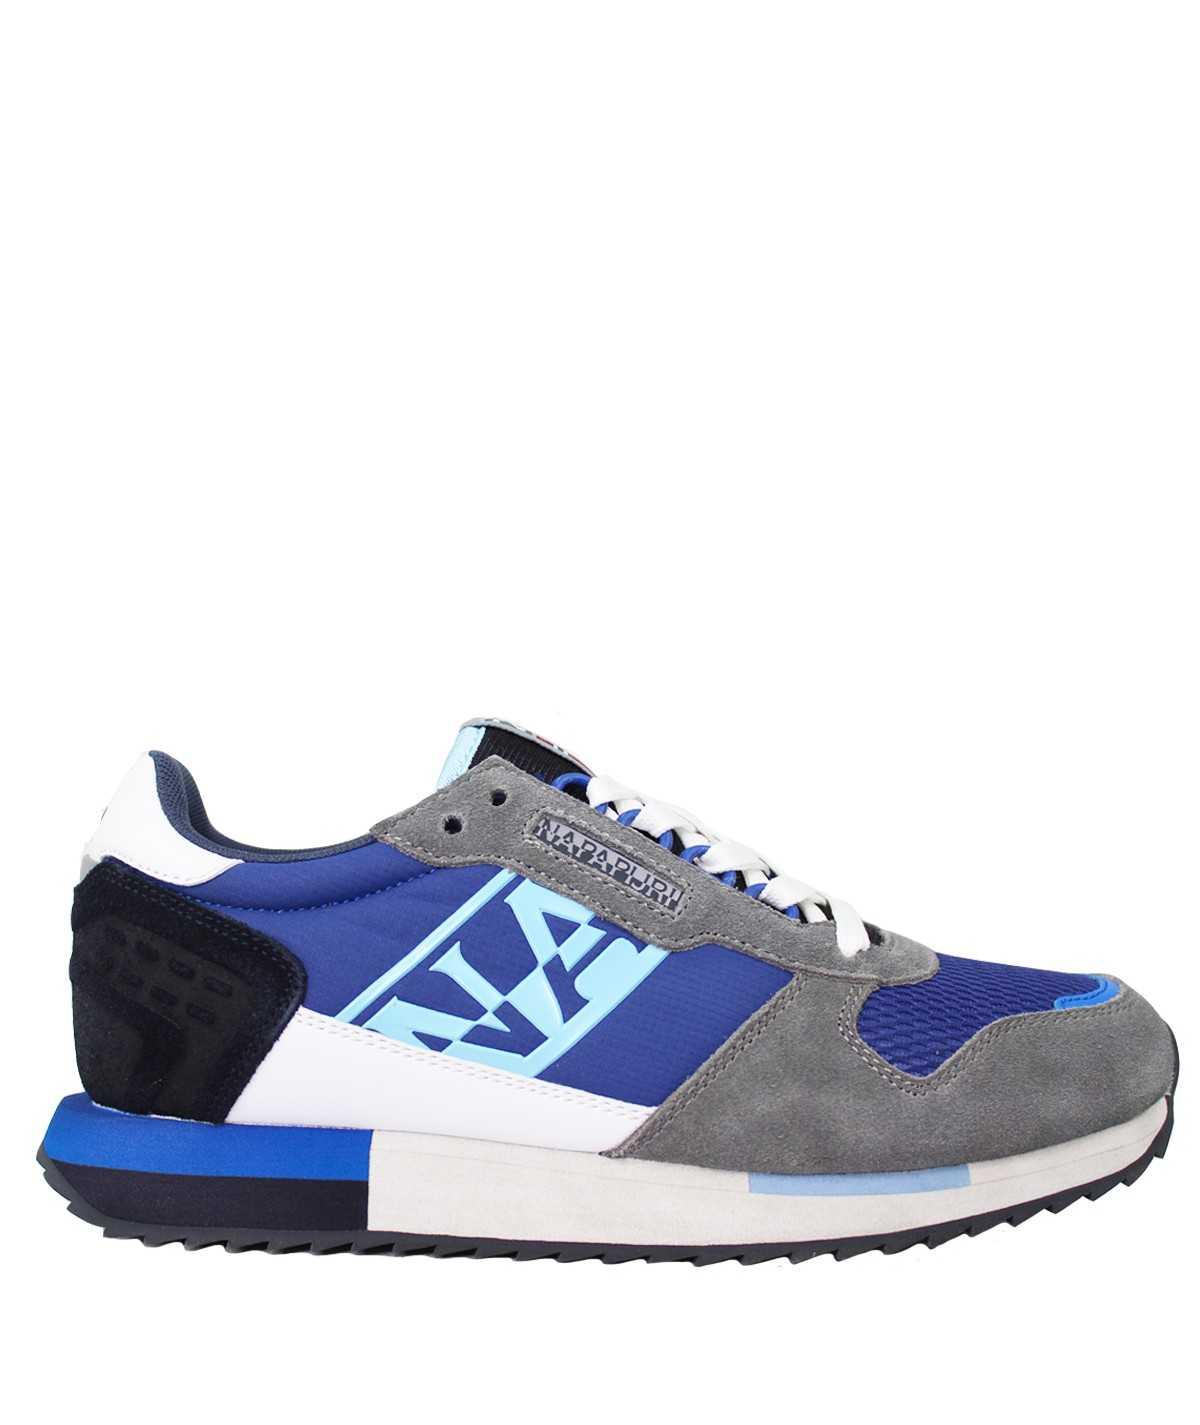 NAPAPIJIRI Sneakers Uomo